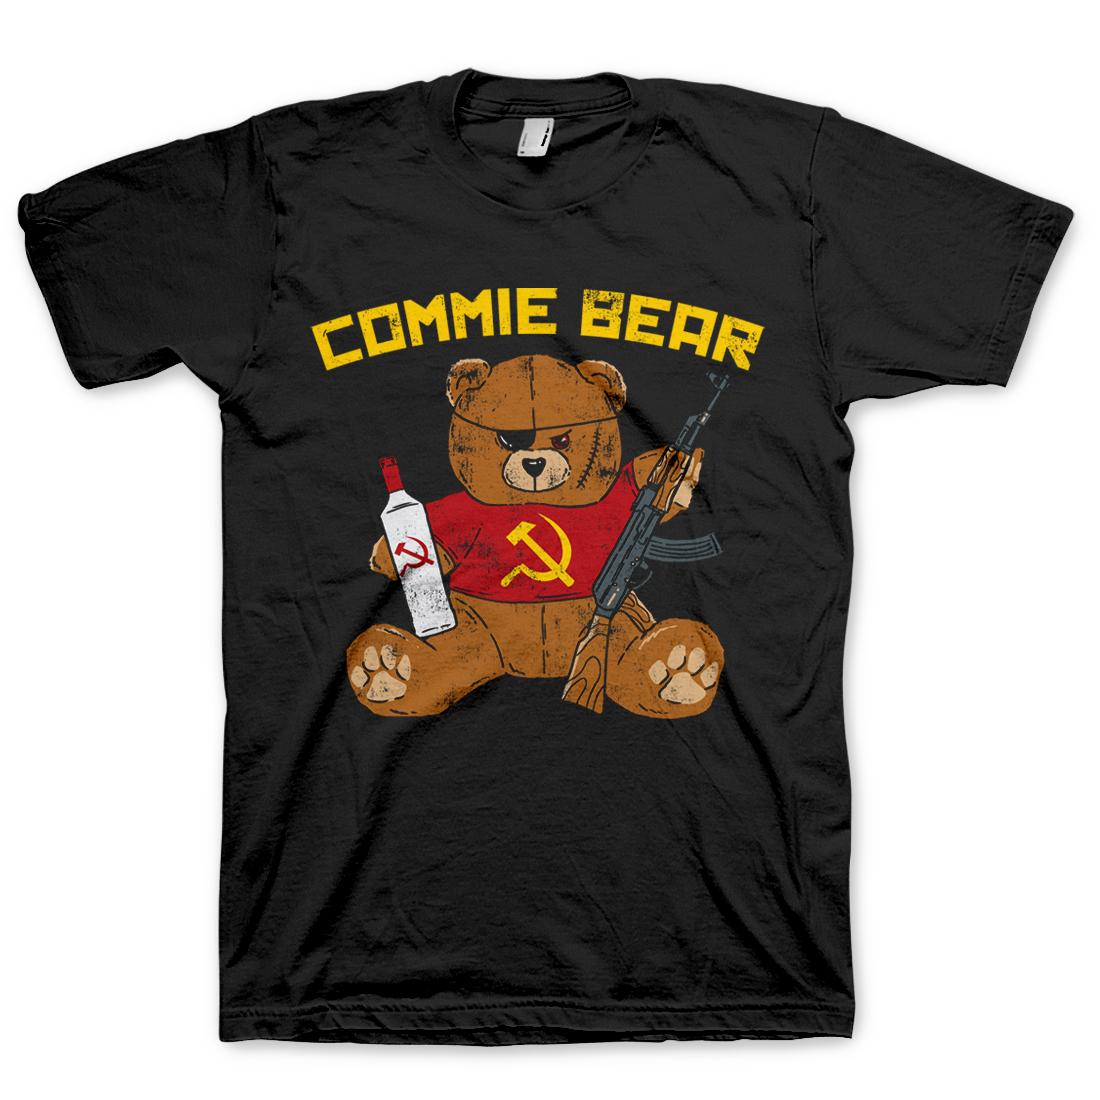 Commie Bear T-Shirt